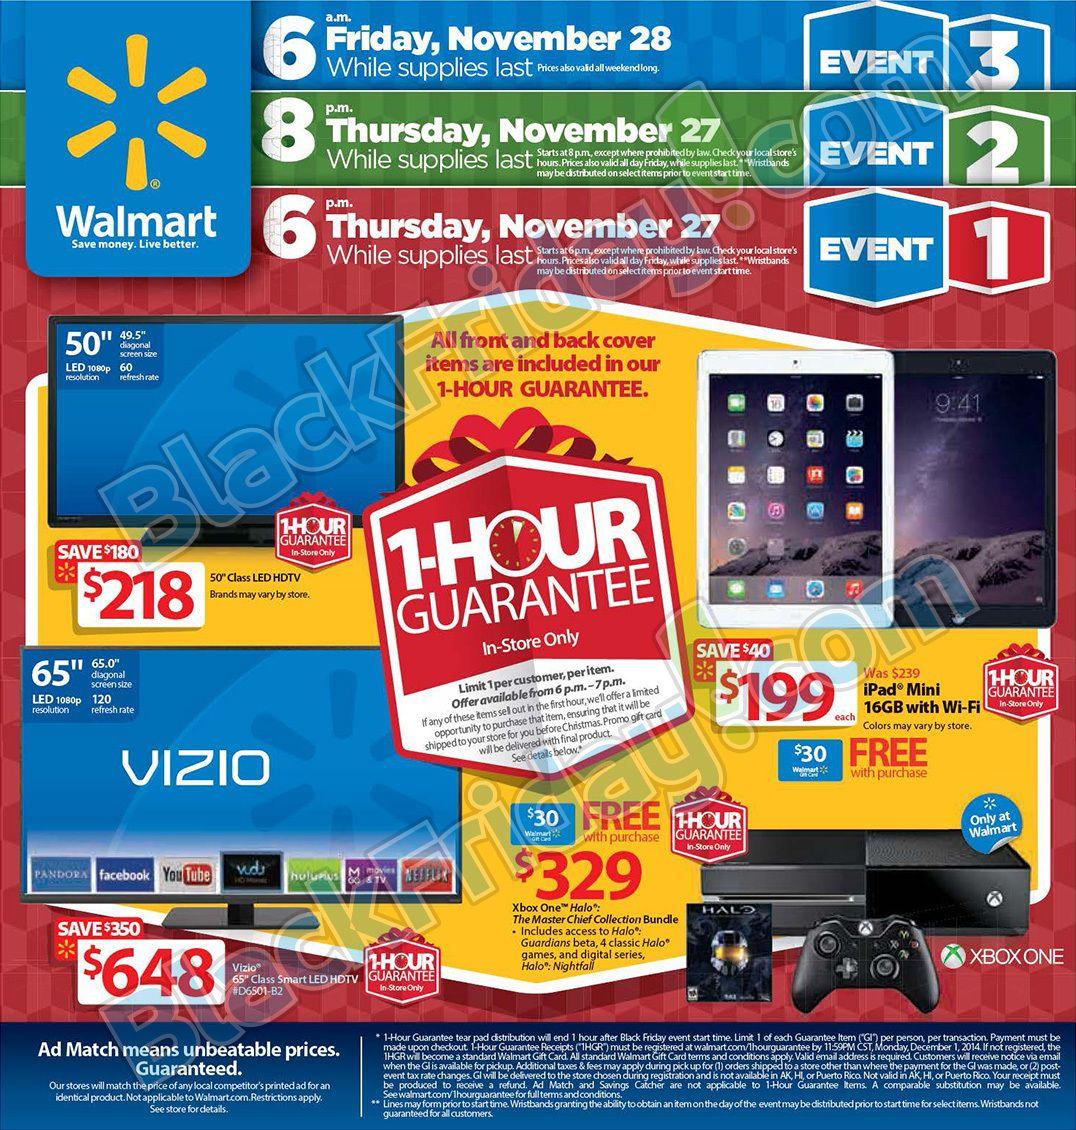 Walmart Black Friday 2014 Ad In 2020 Walmart Black Friday Ad Black Friday Ads Black Friday